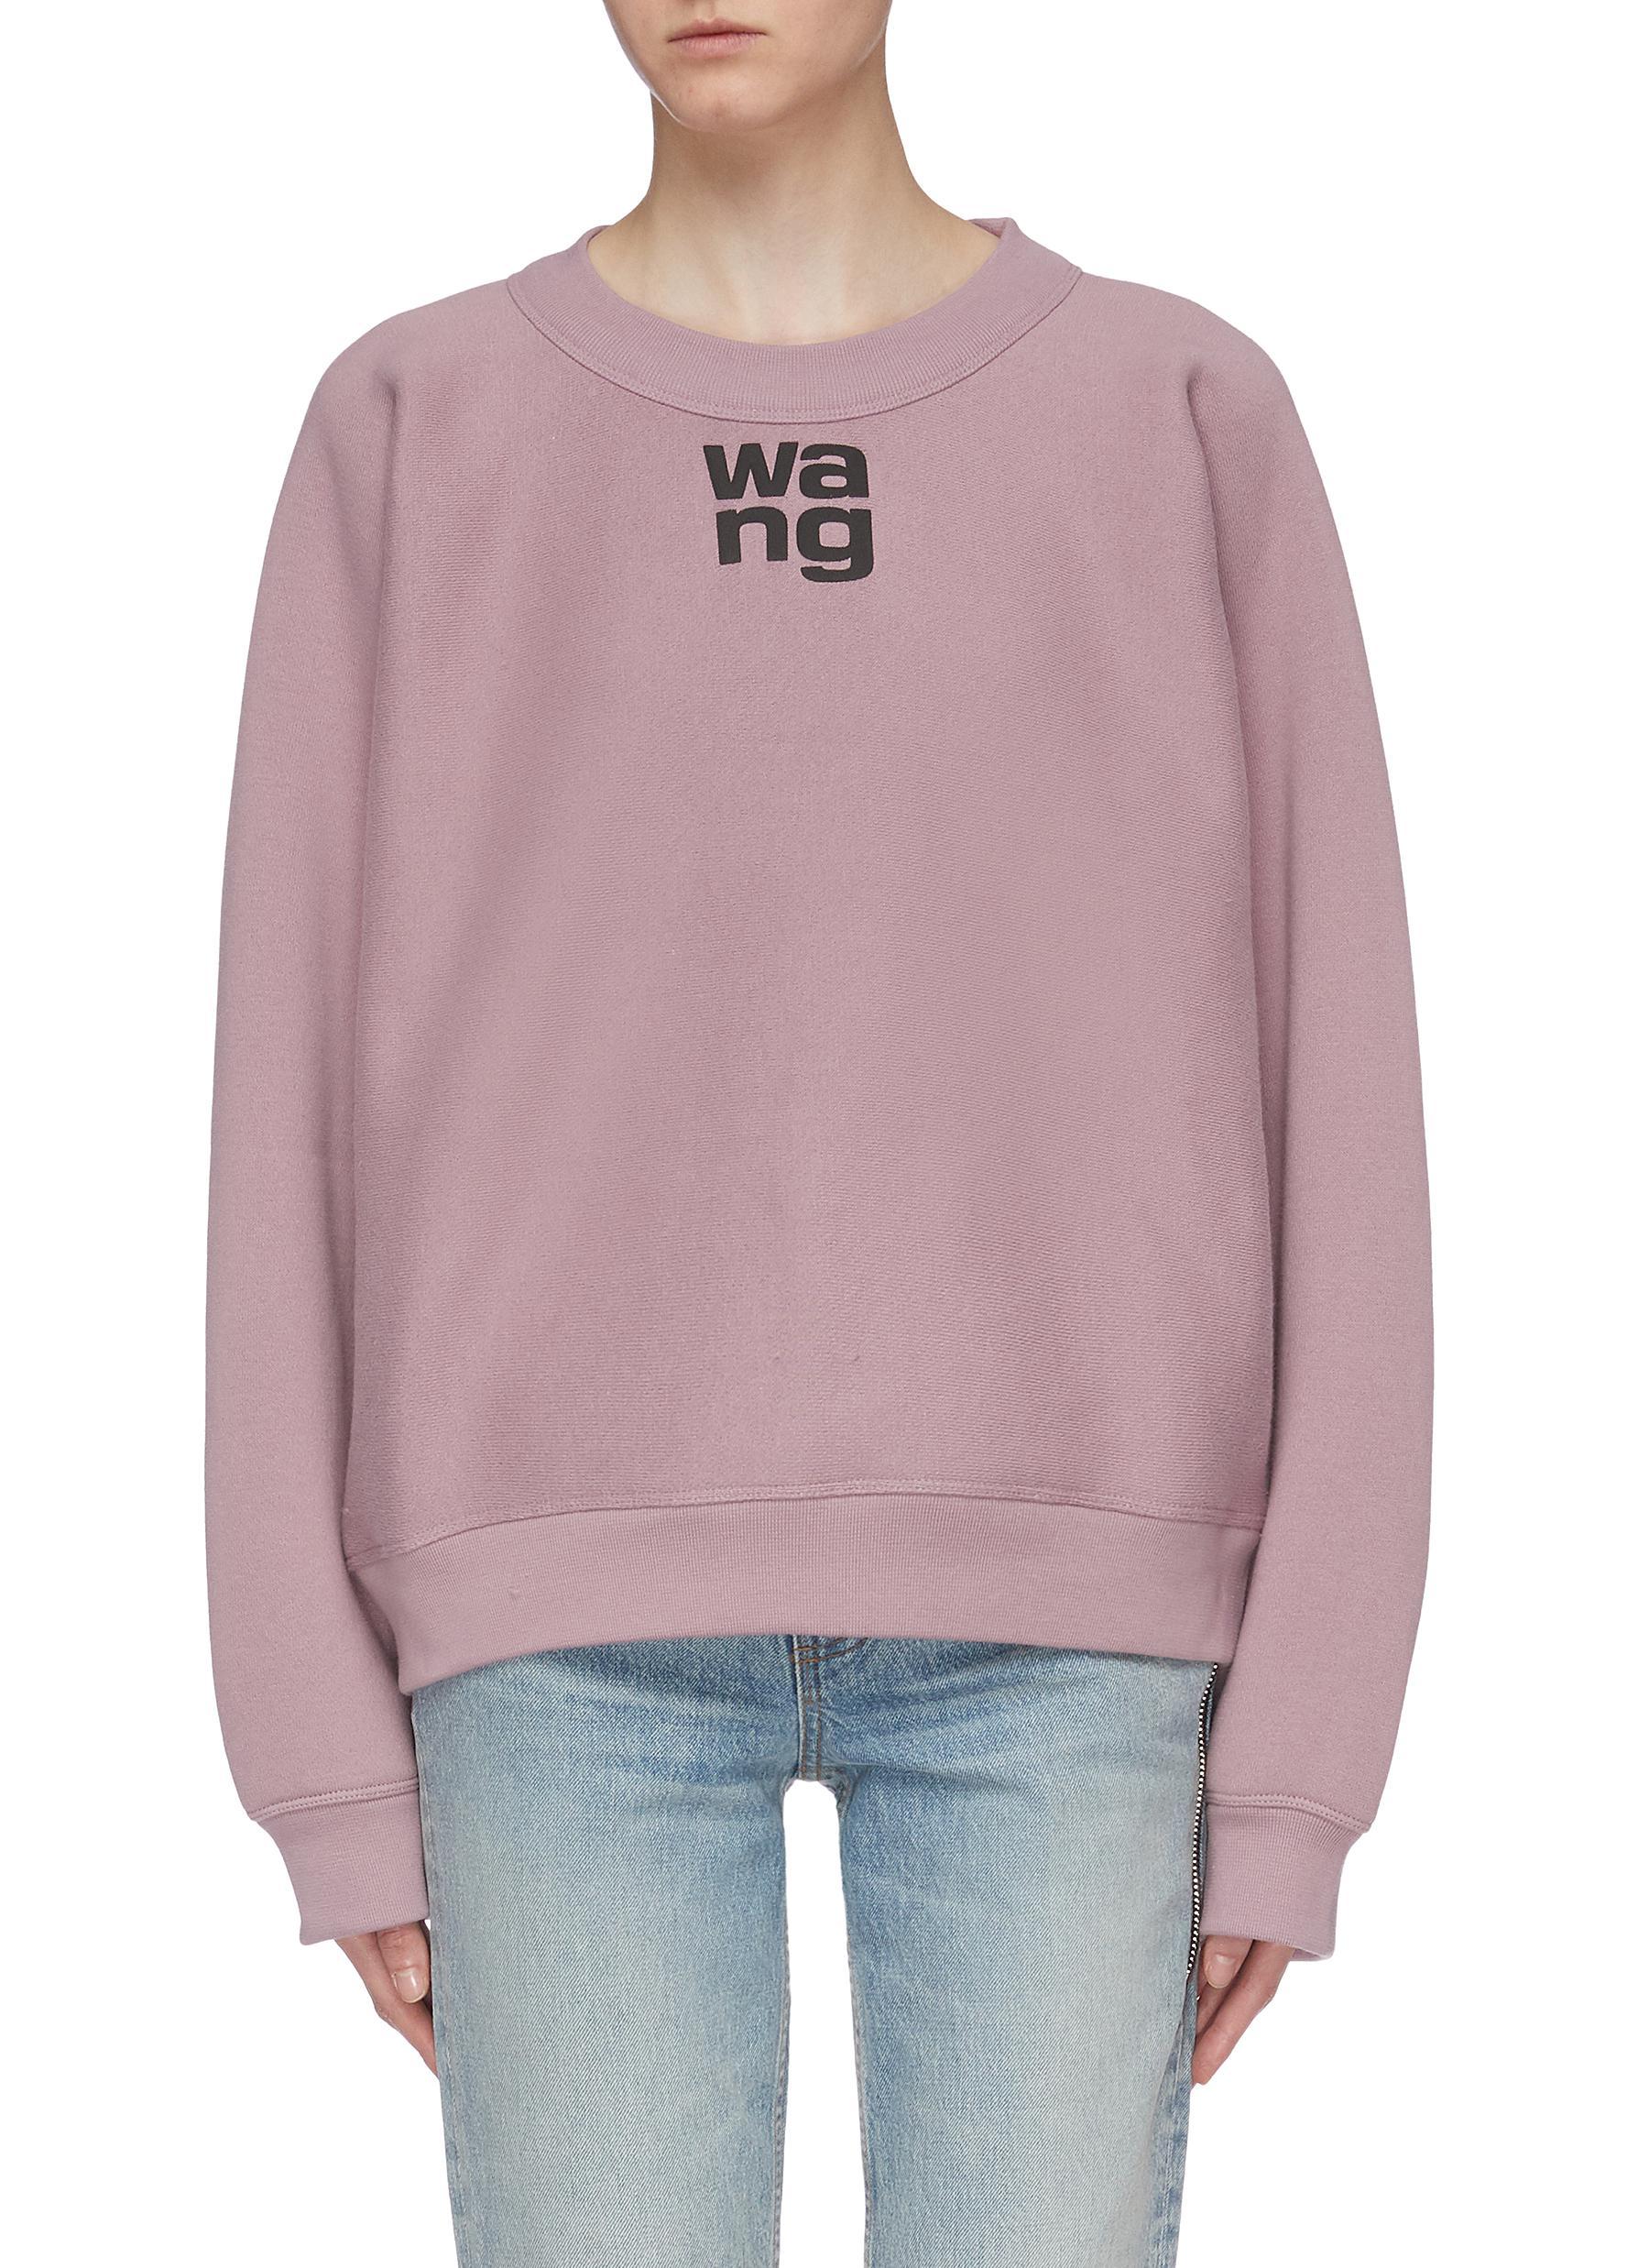 Wash + Go logo print oversized sweatshirt by Alexanderwang.T